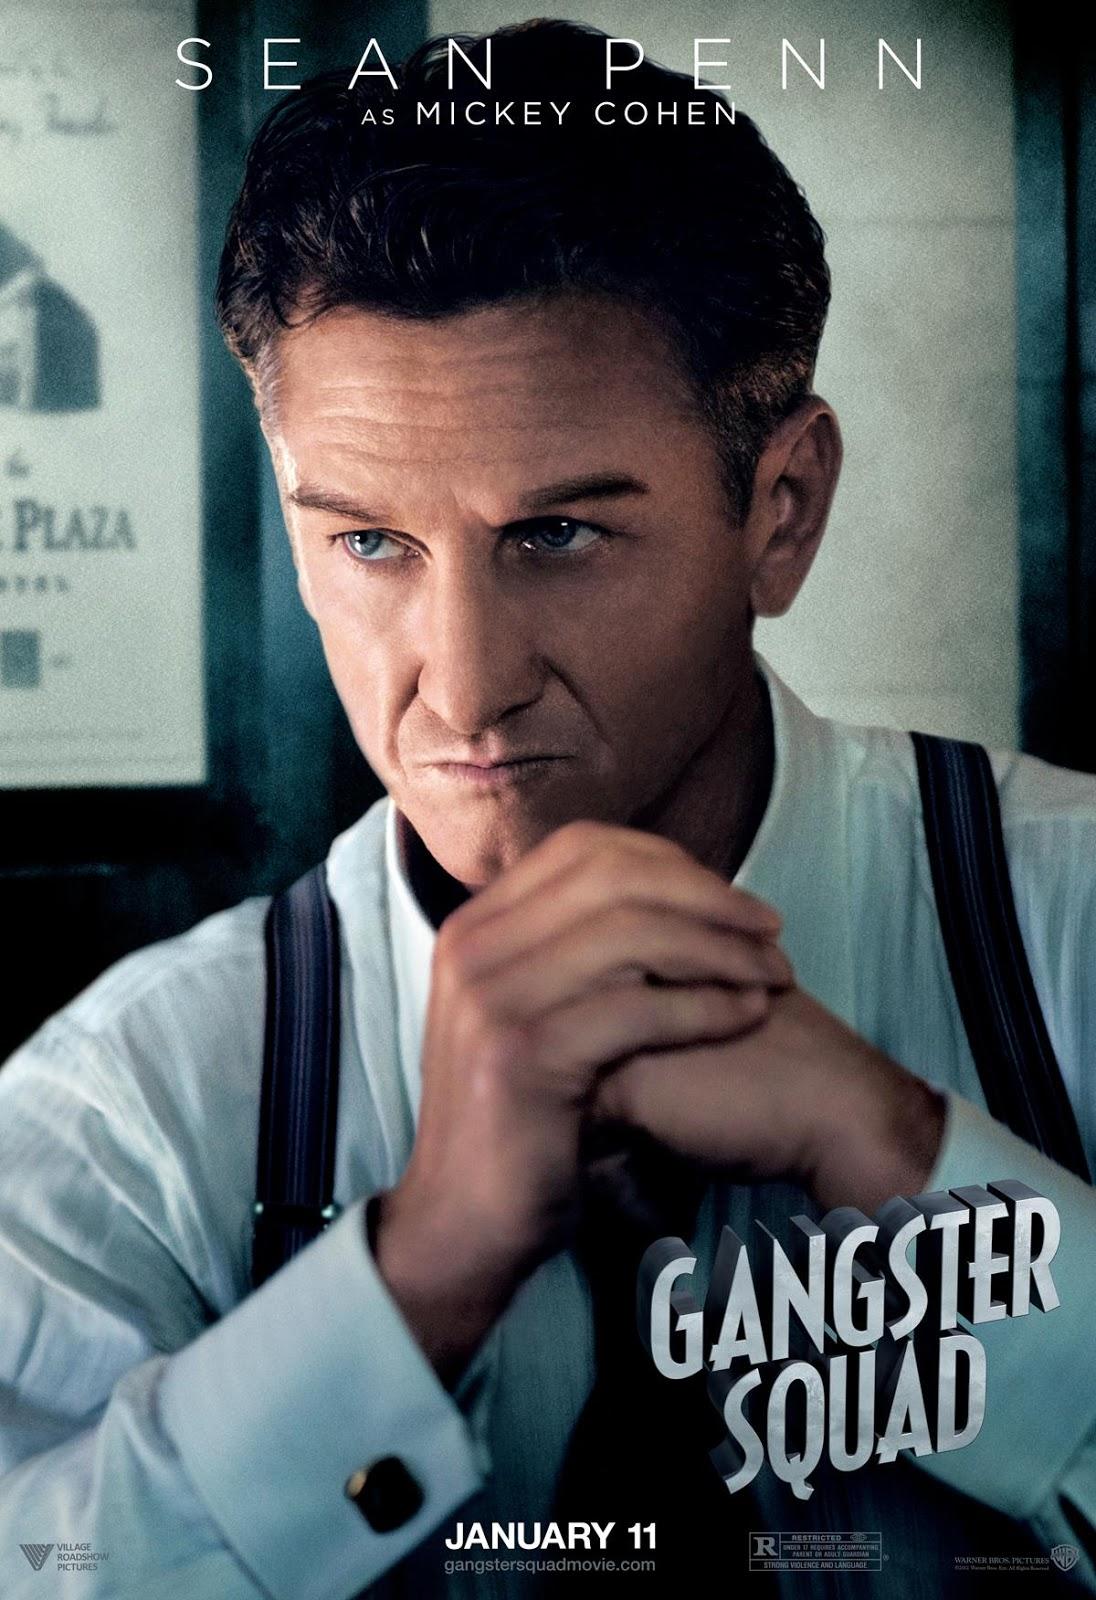 http://4.bp.blogspot.com/-KN9E-ks6EW4/UKmMOVx8iKI/AAAAAAAAVFw/u1i9dLSgO-o/s1600/gangster-squad-poster-sean-penn-2.jpg